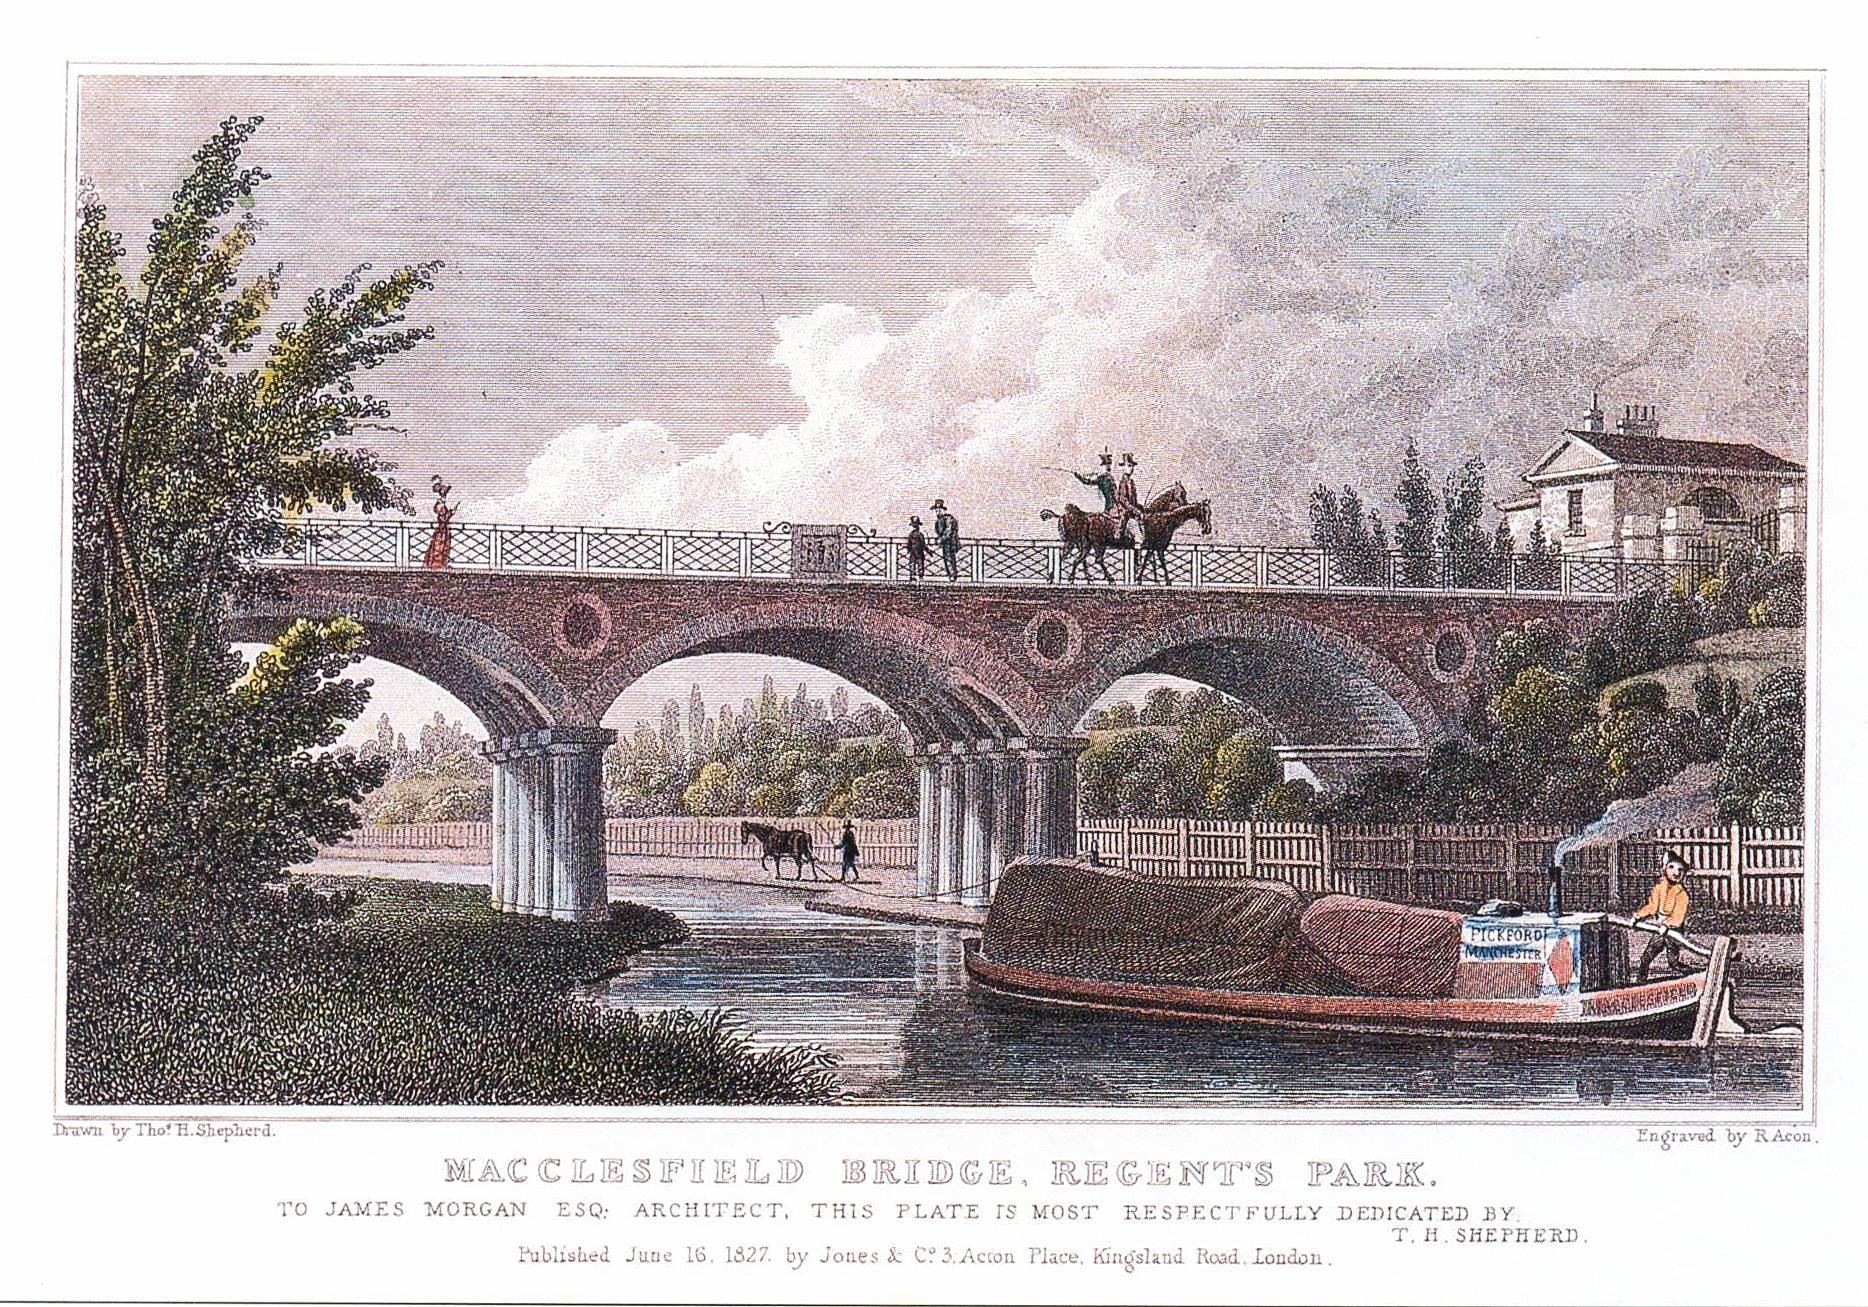 02 macclesfield - Regent's Canal 200th